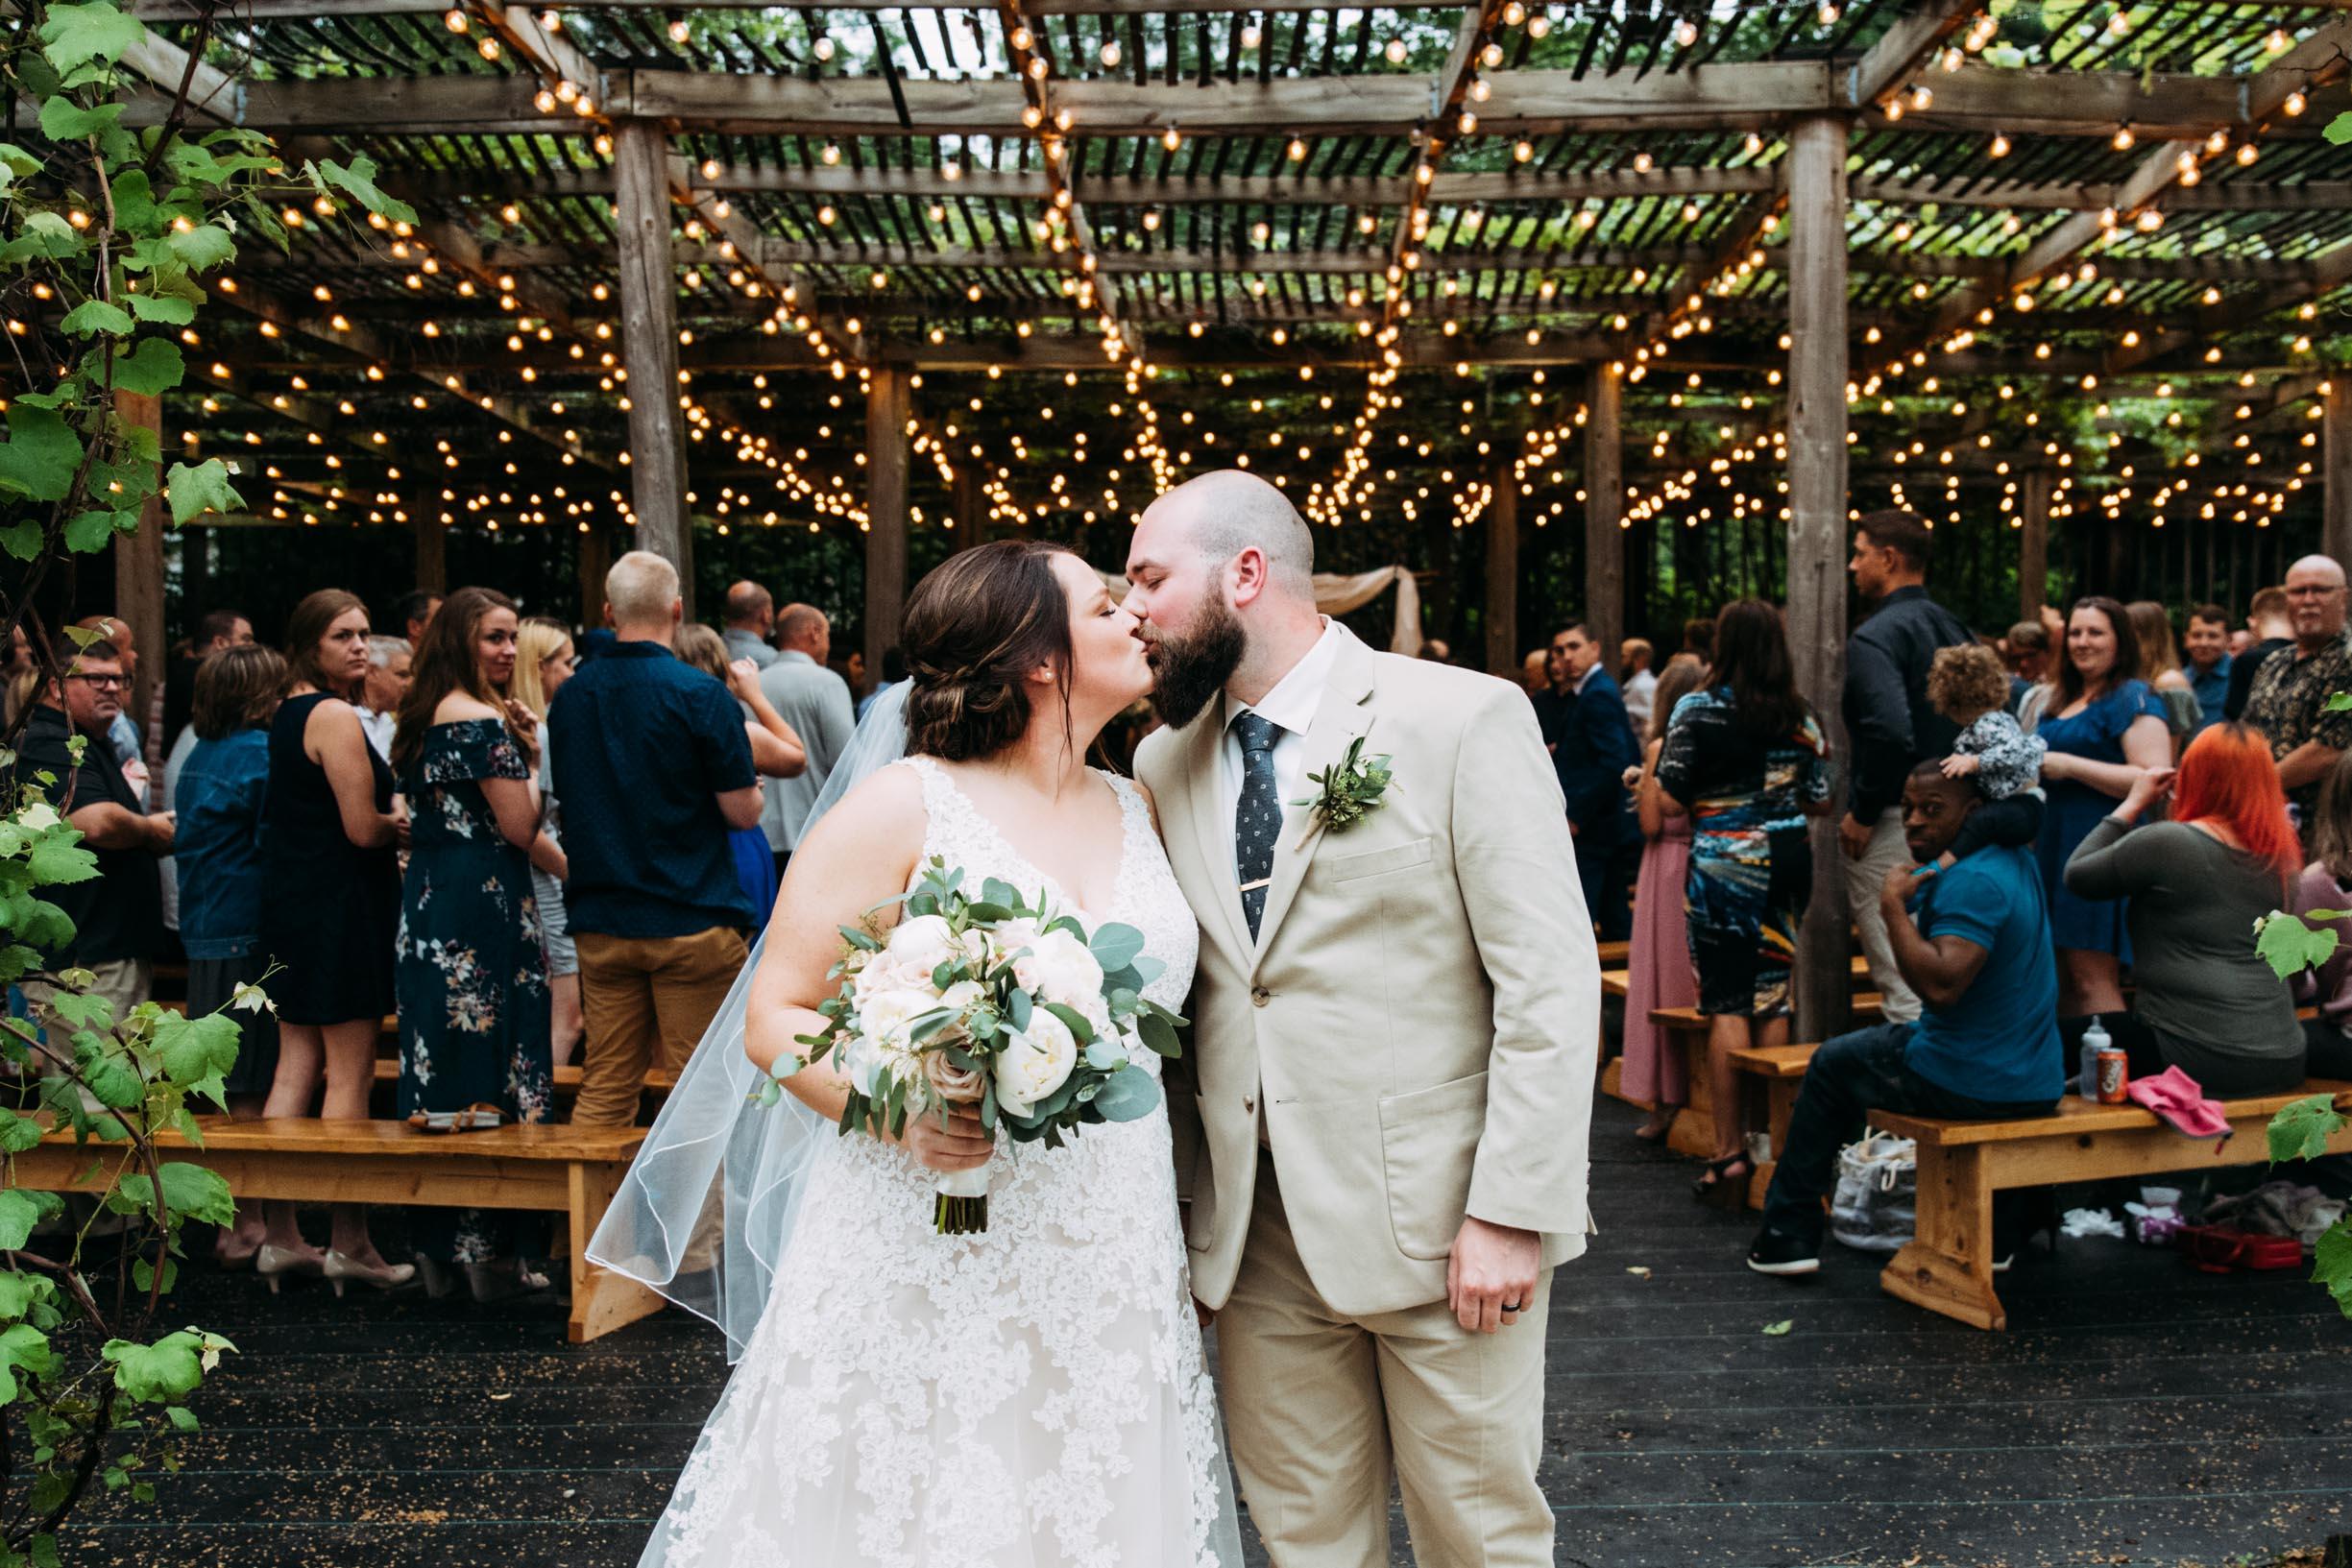 52-Jess_Jeremy_Minnesota_Wedding_Ceremony.jpg